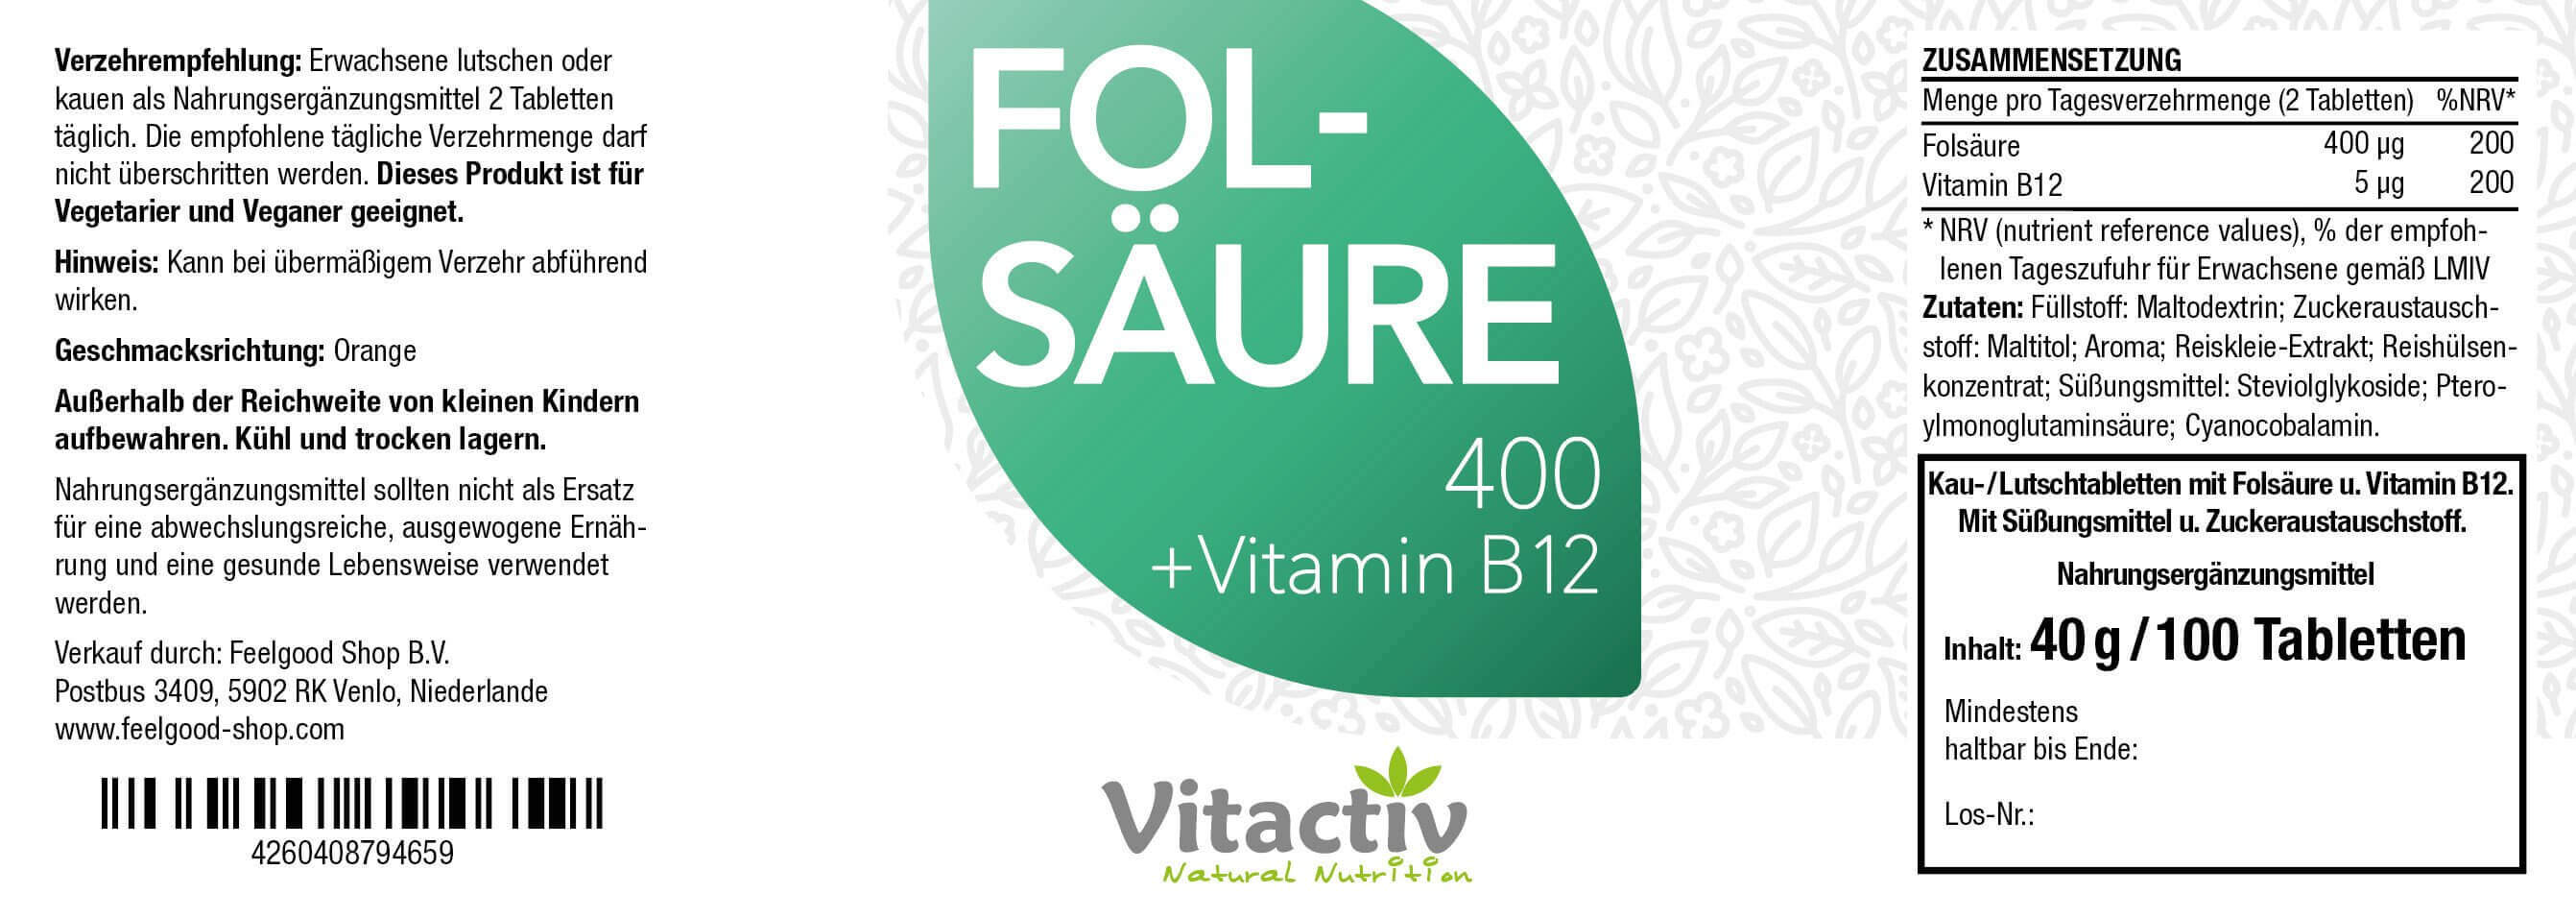 FOLSÄURE 400 + Vitamin B12